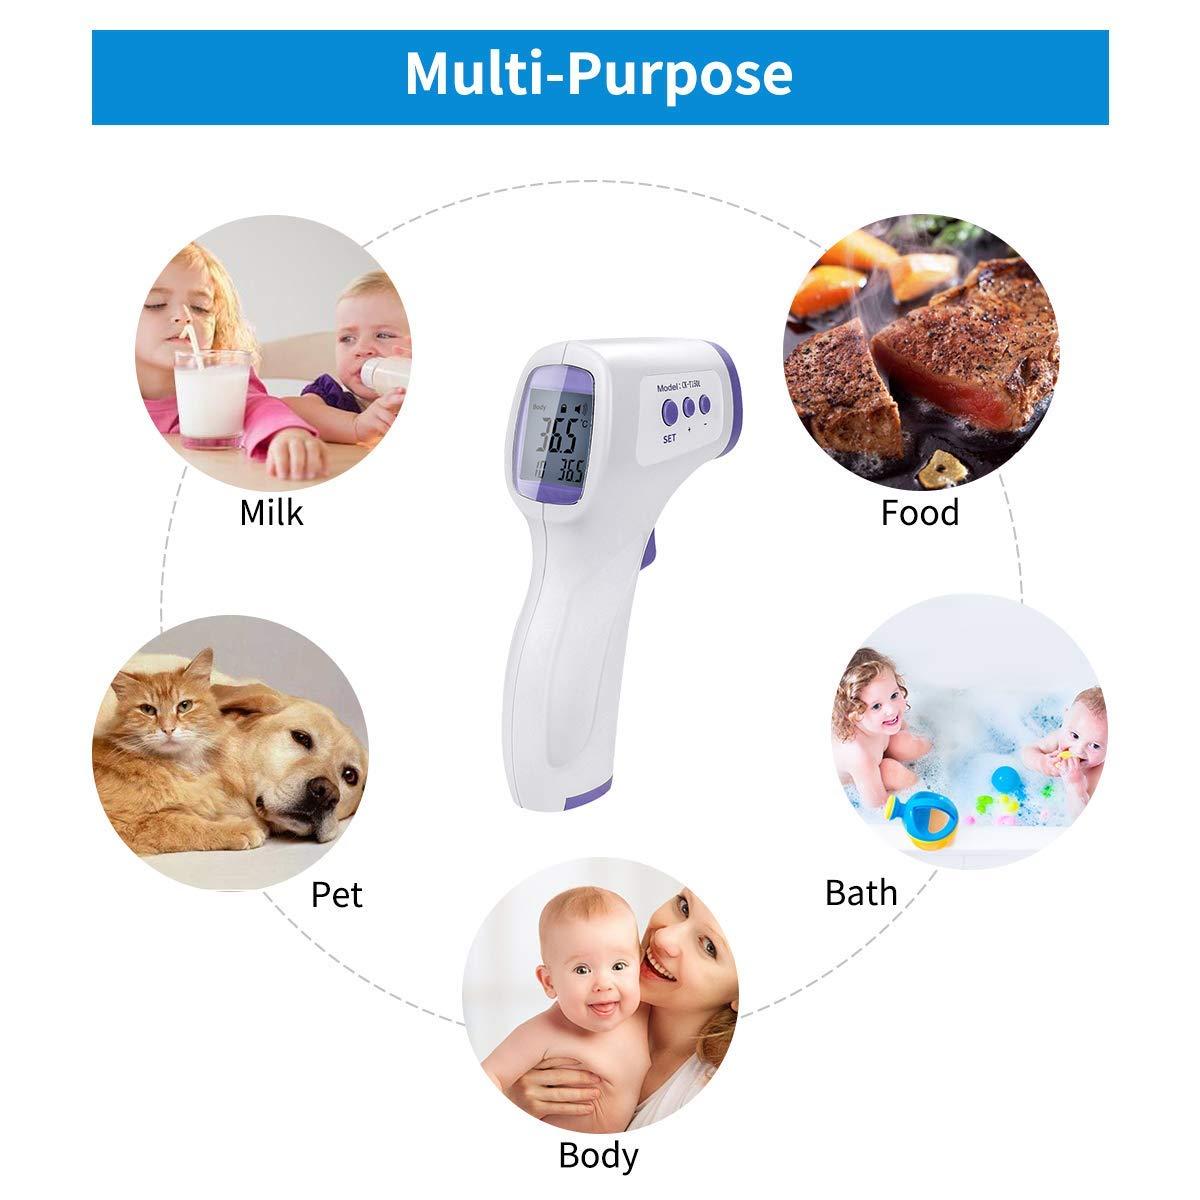 Kinder Erwachsene 2er Pack digitales Mehrzweck-Infrarot-Thermometer Ber/ührungsloses Stirnthermometer mit LCD-Display Stirnthermometer ohne Ber/ührung Geeignet f/ür S/äuglinge